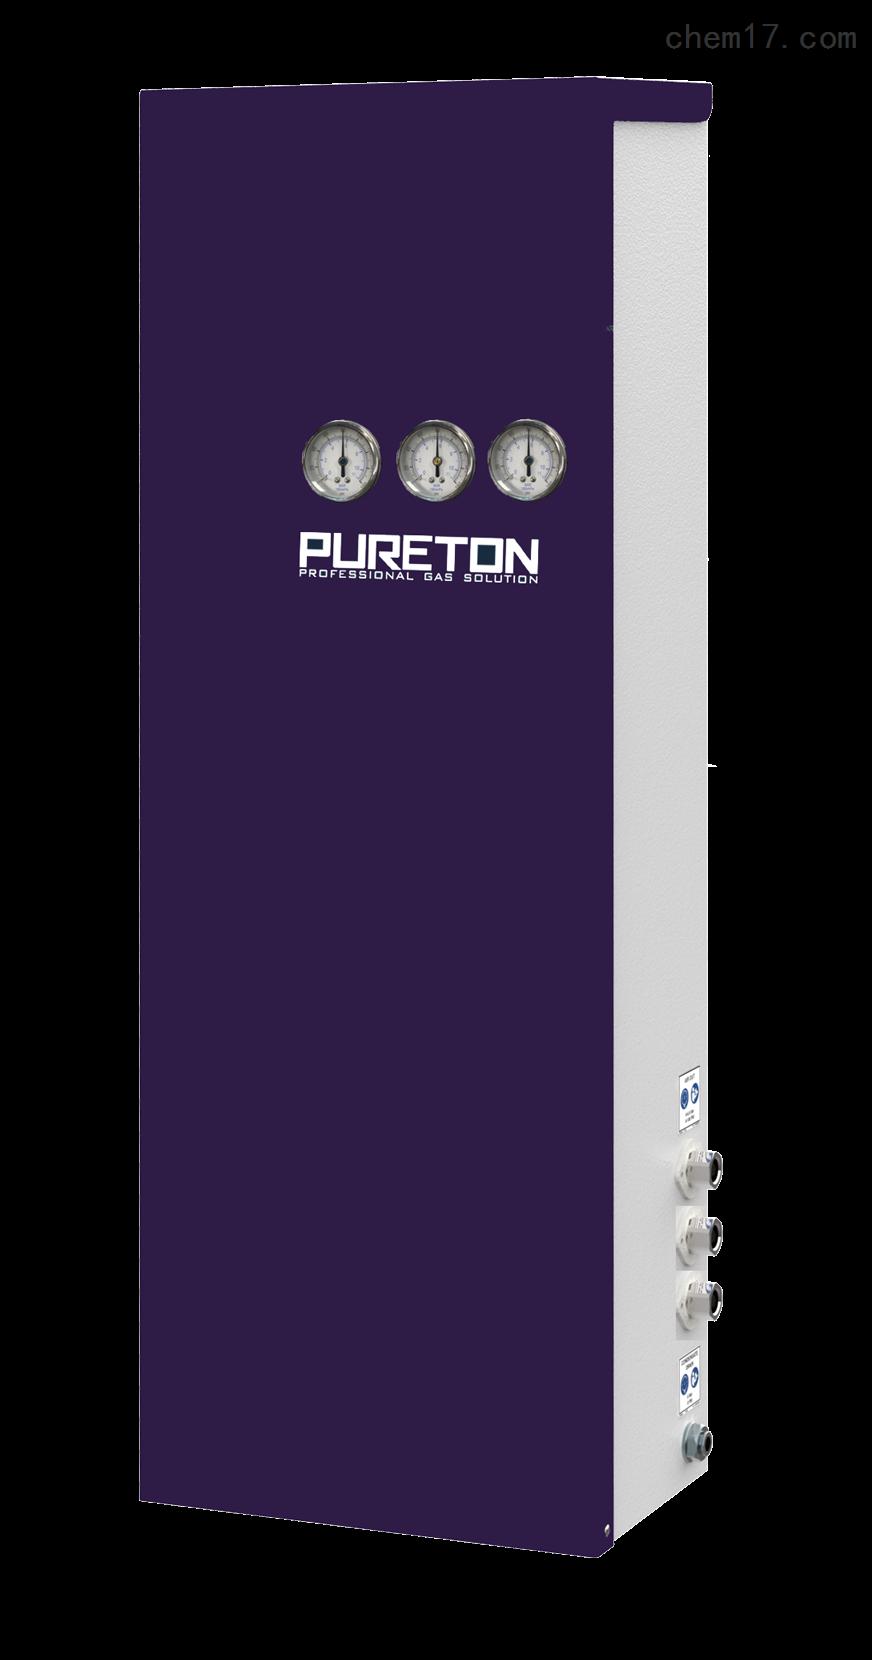 PURETON系列-Mate 50/ Mate 60氮气发生器